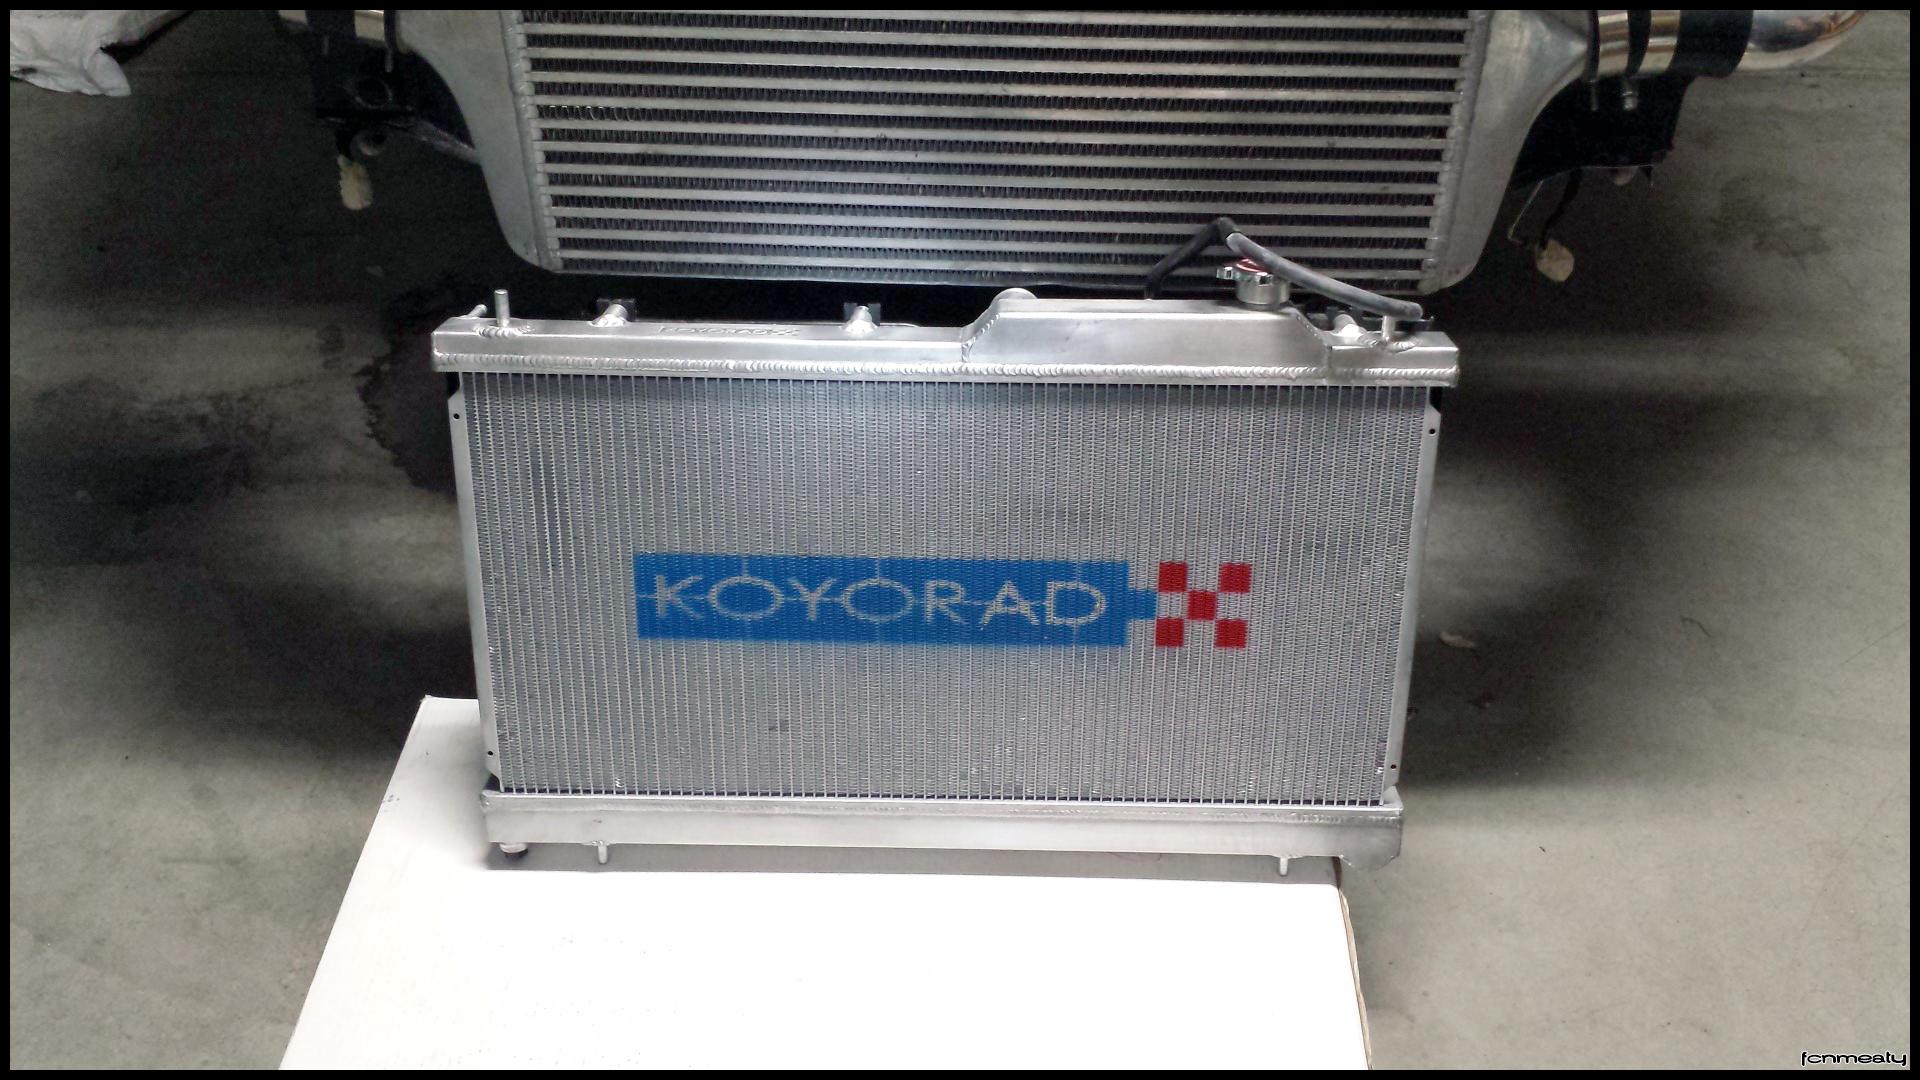 http://i.rideekulo.us/sti/build/phase3/20140718/radiator.jpg